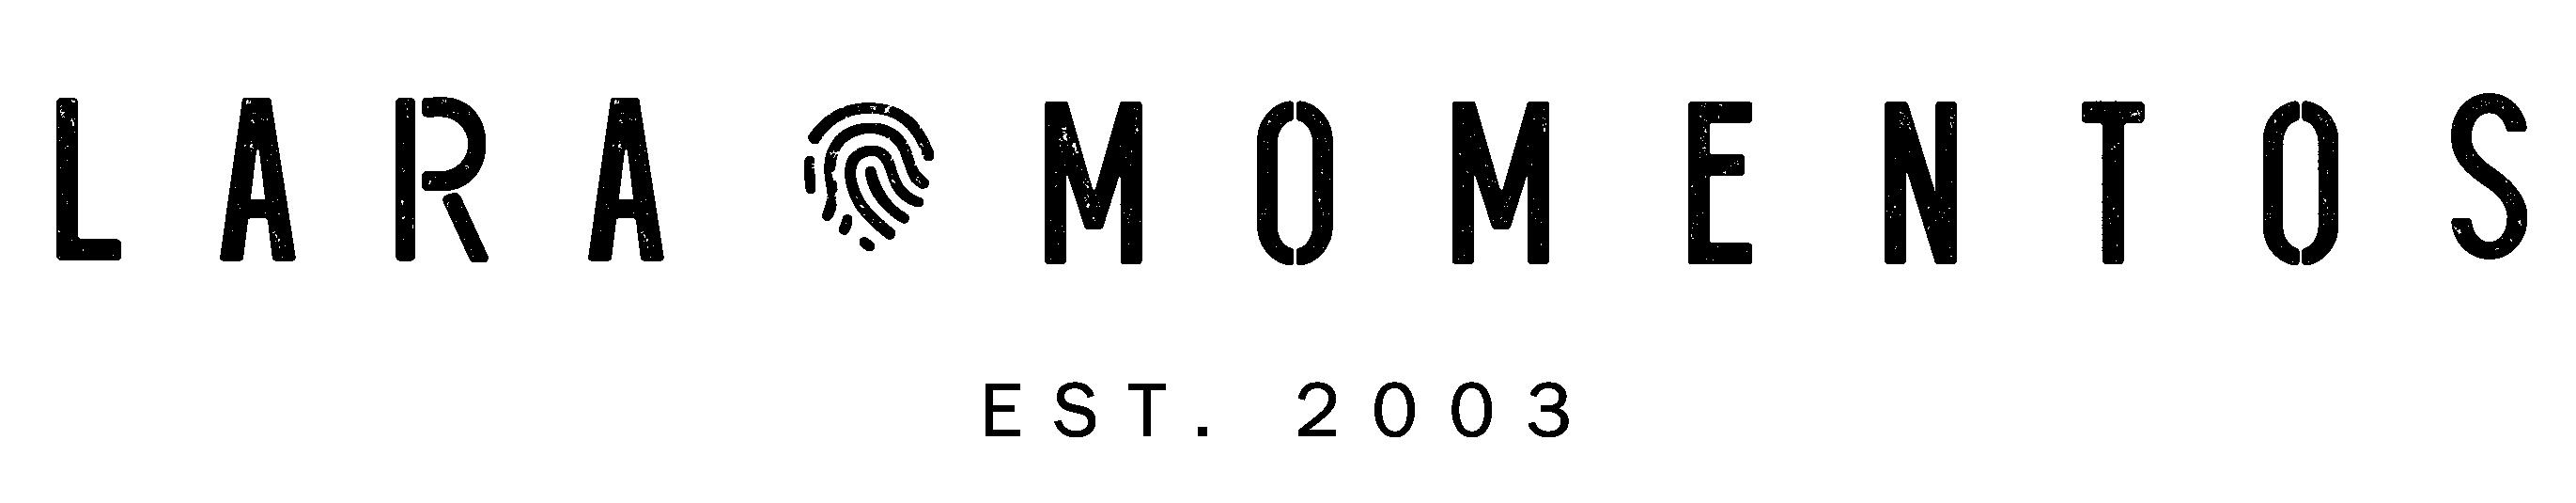 Laramomentos